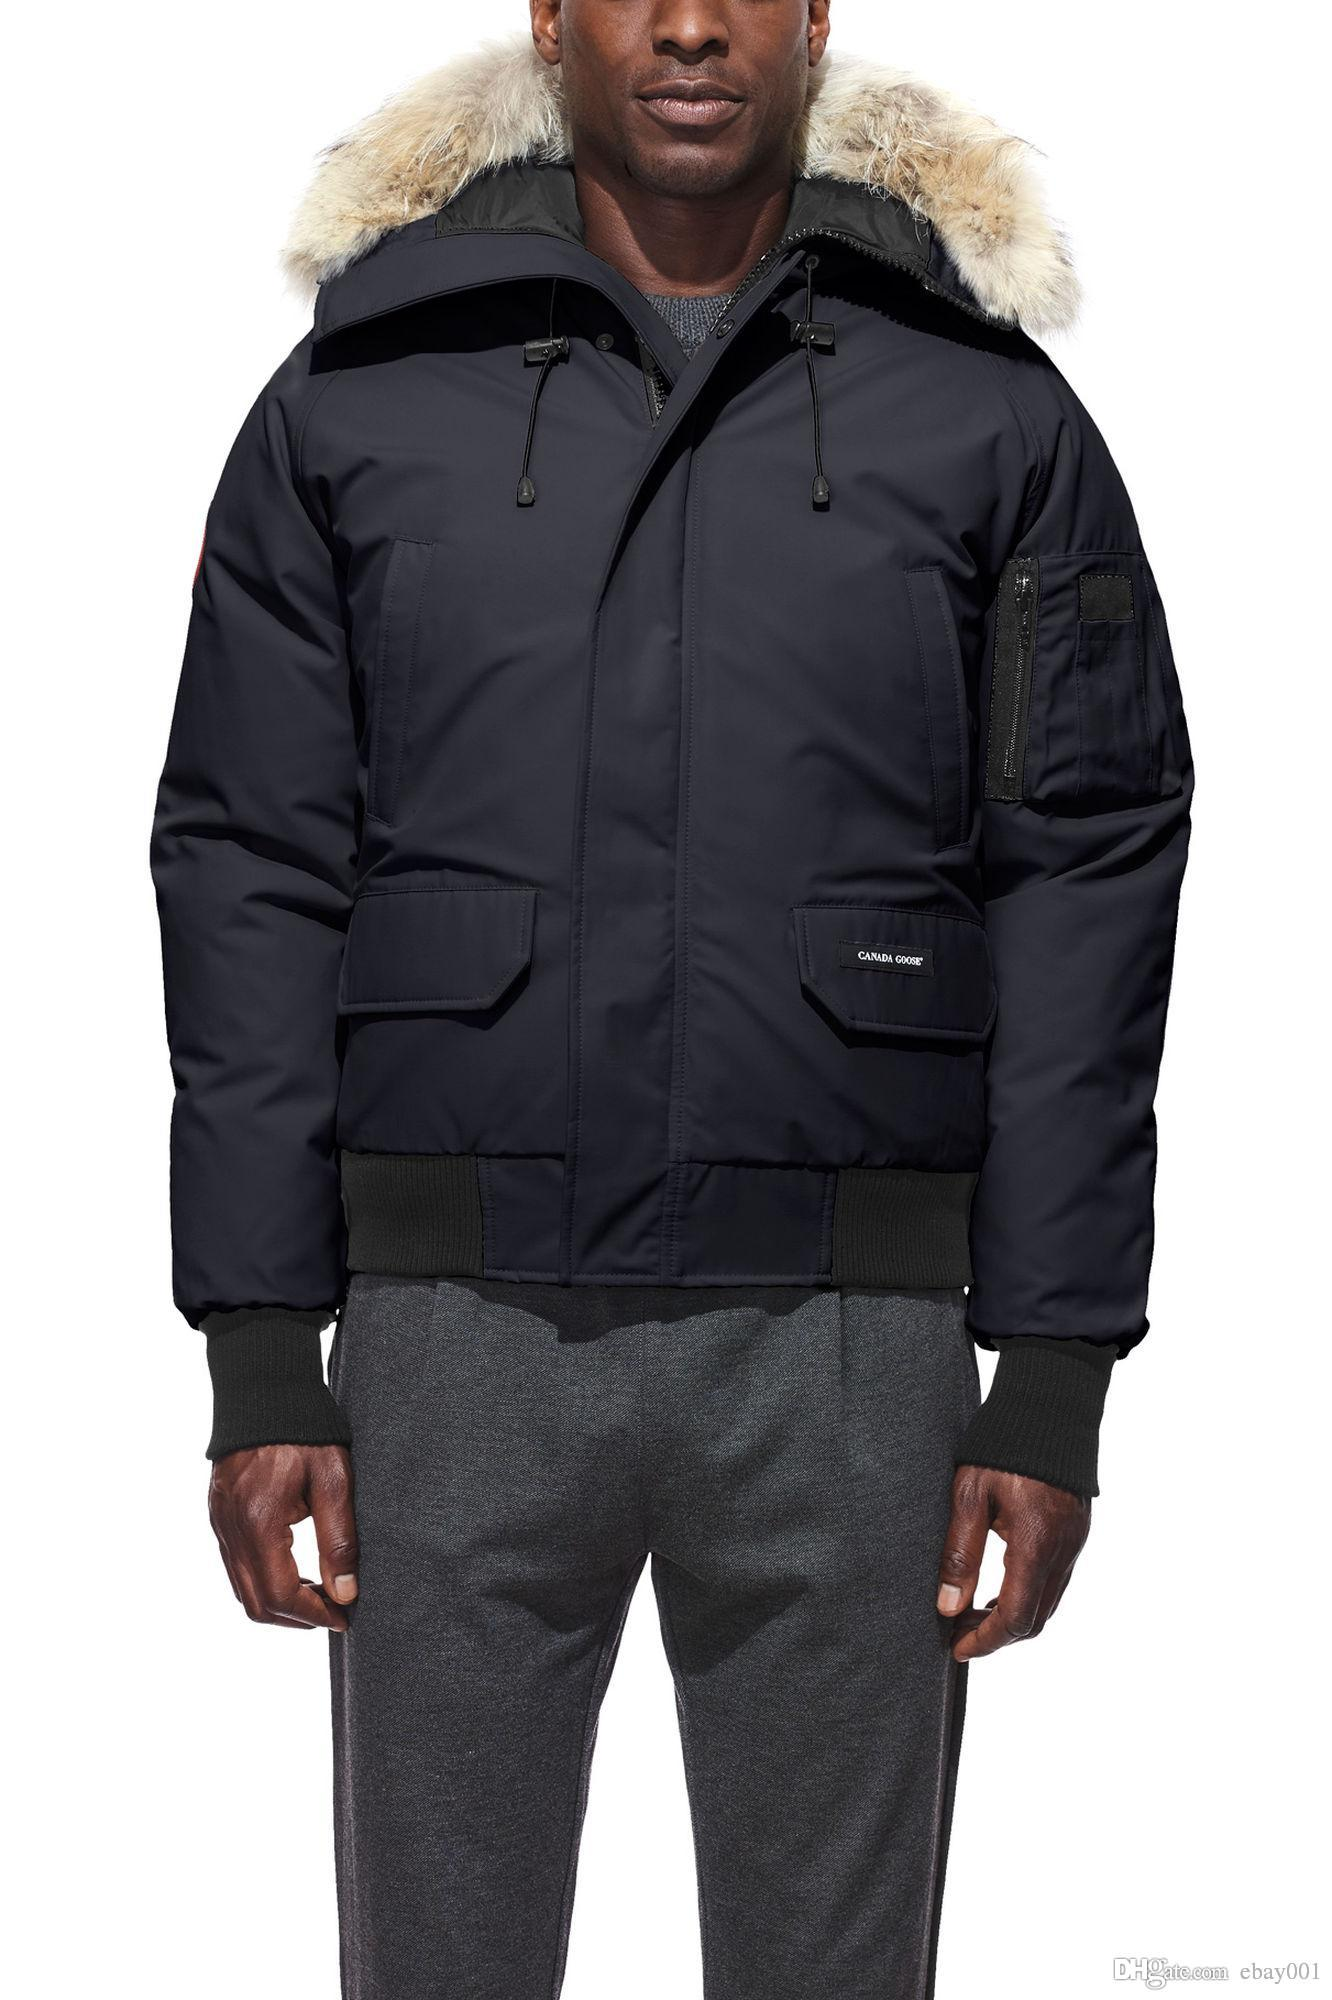 a20c5f1dbd2 2019 2018 Overcoat Mens Winter Warm Coat Goose Chilliwack Bomber Goose Down Jacket  For Men Bomber Parka Real Coyote Fur Black Label For Men From Ebay001